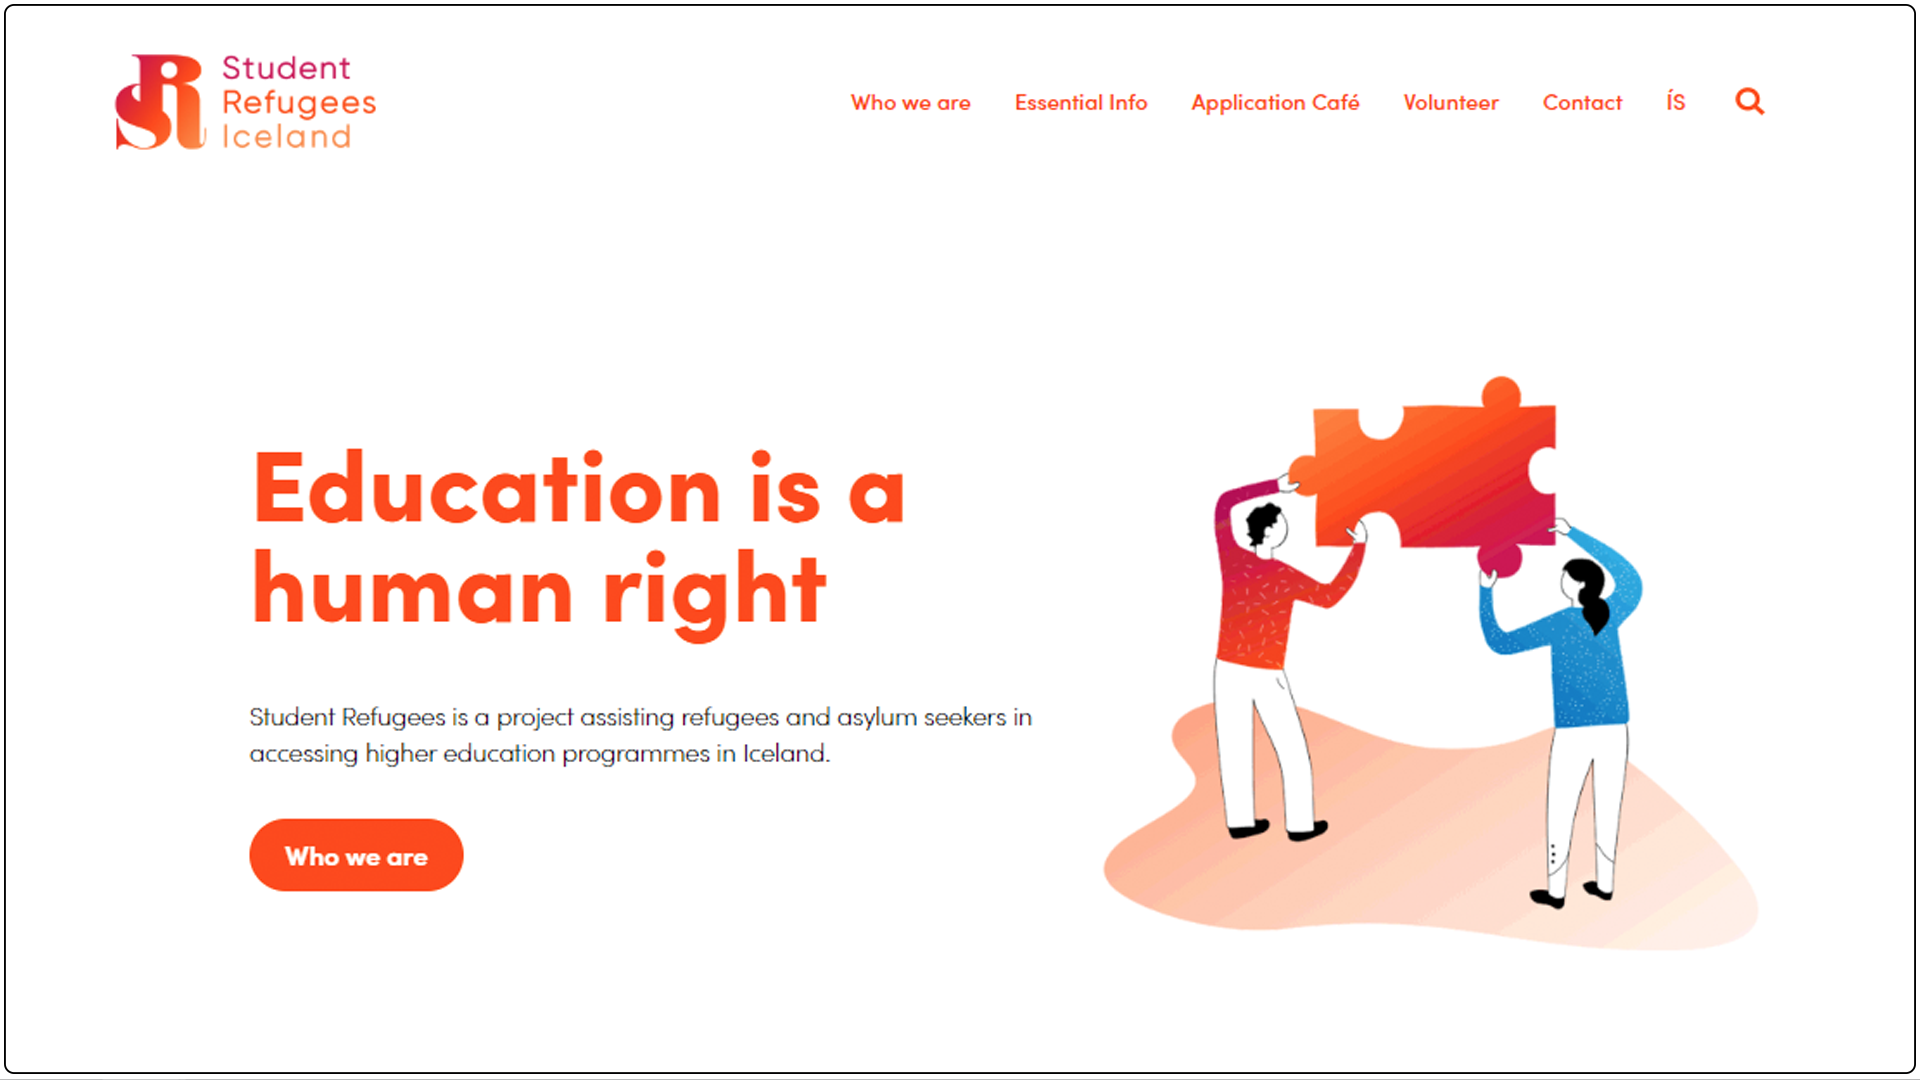 Student Refugees Iceland: web design + web development + logo design + branding + illustrations + animations